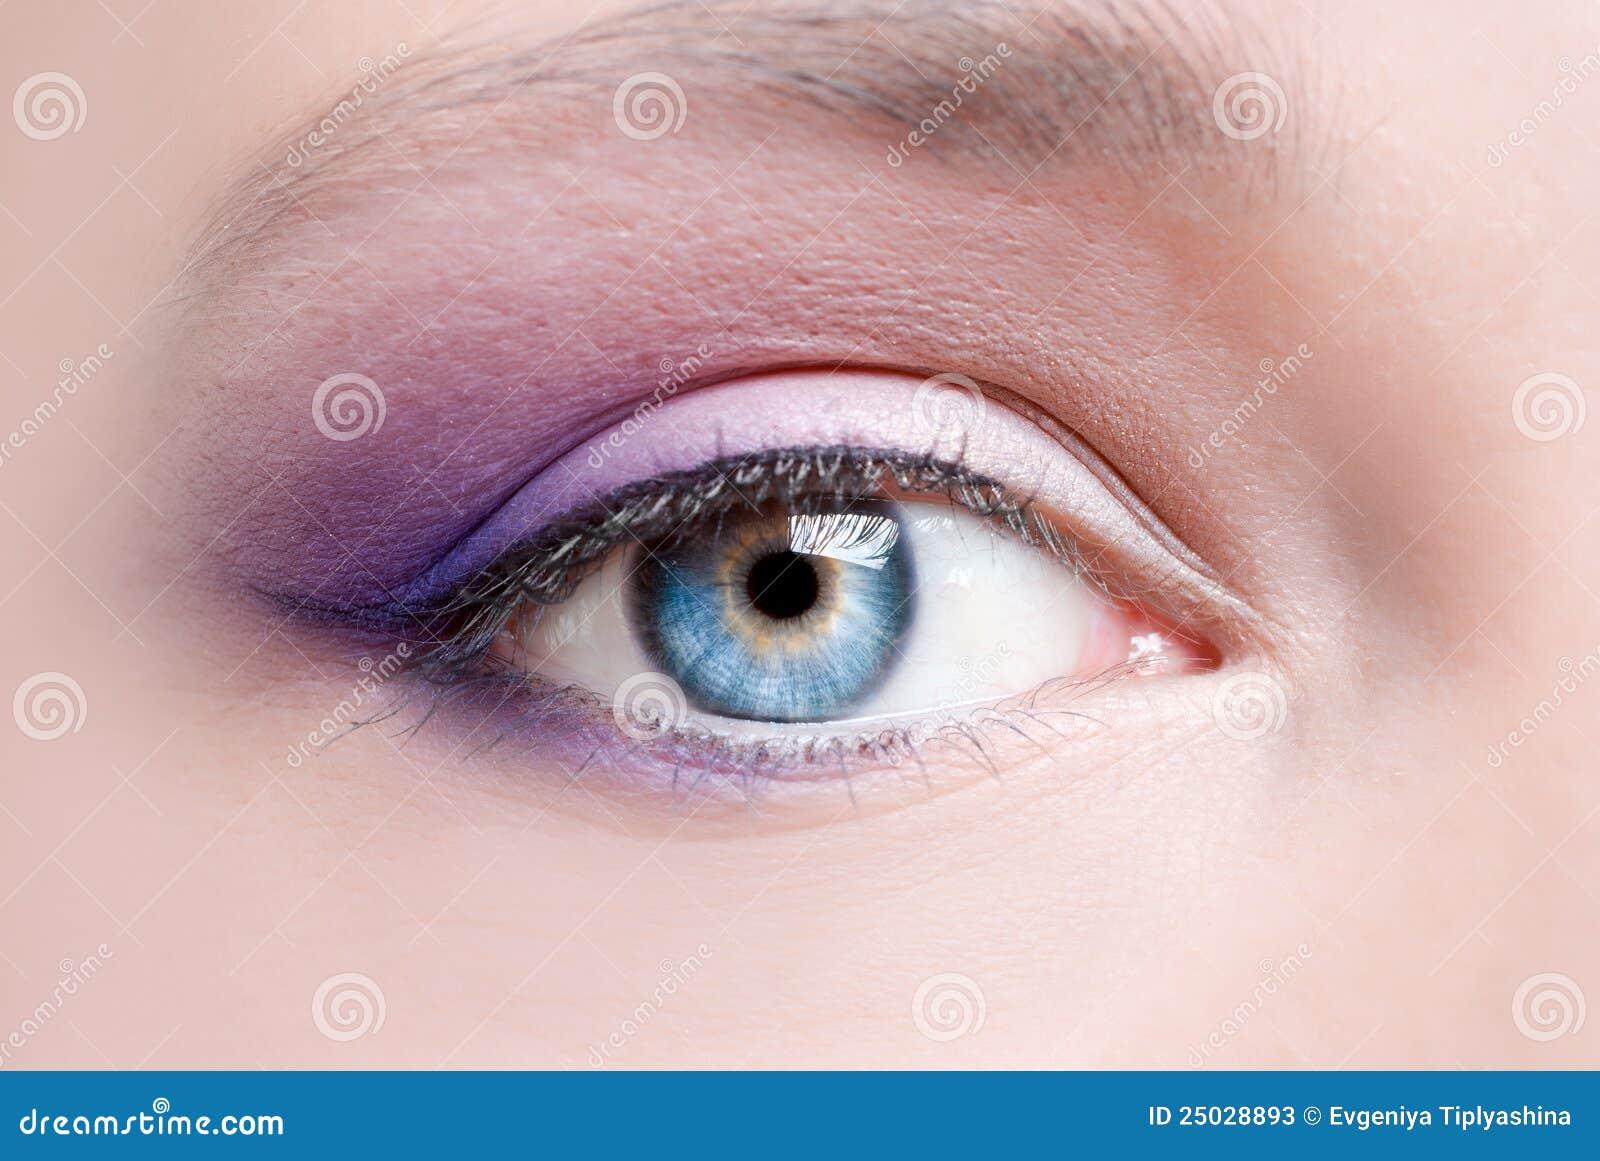 Makeup av ett kvinnligöga